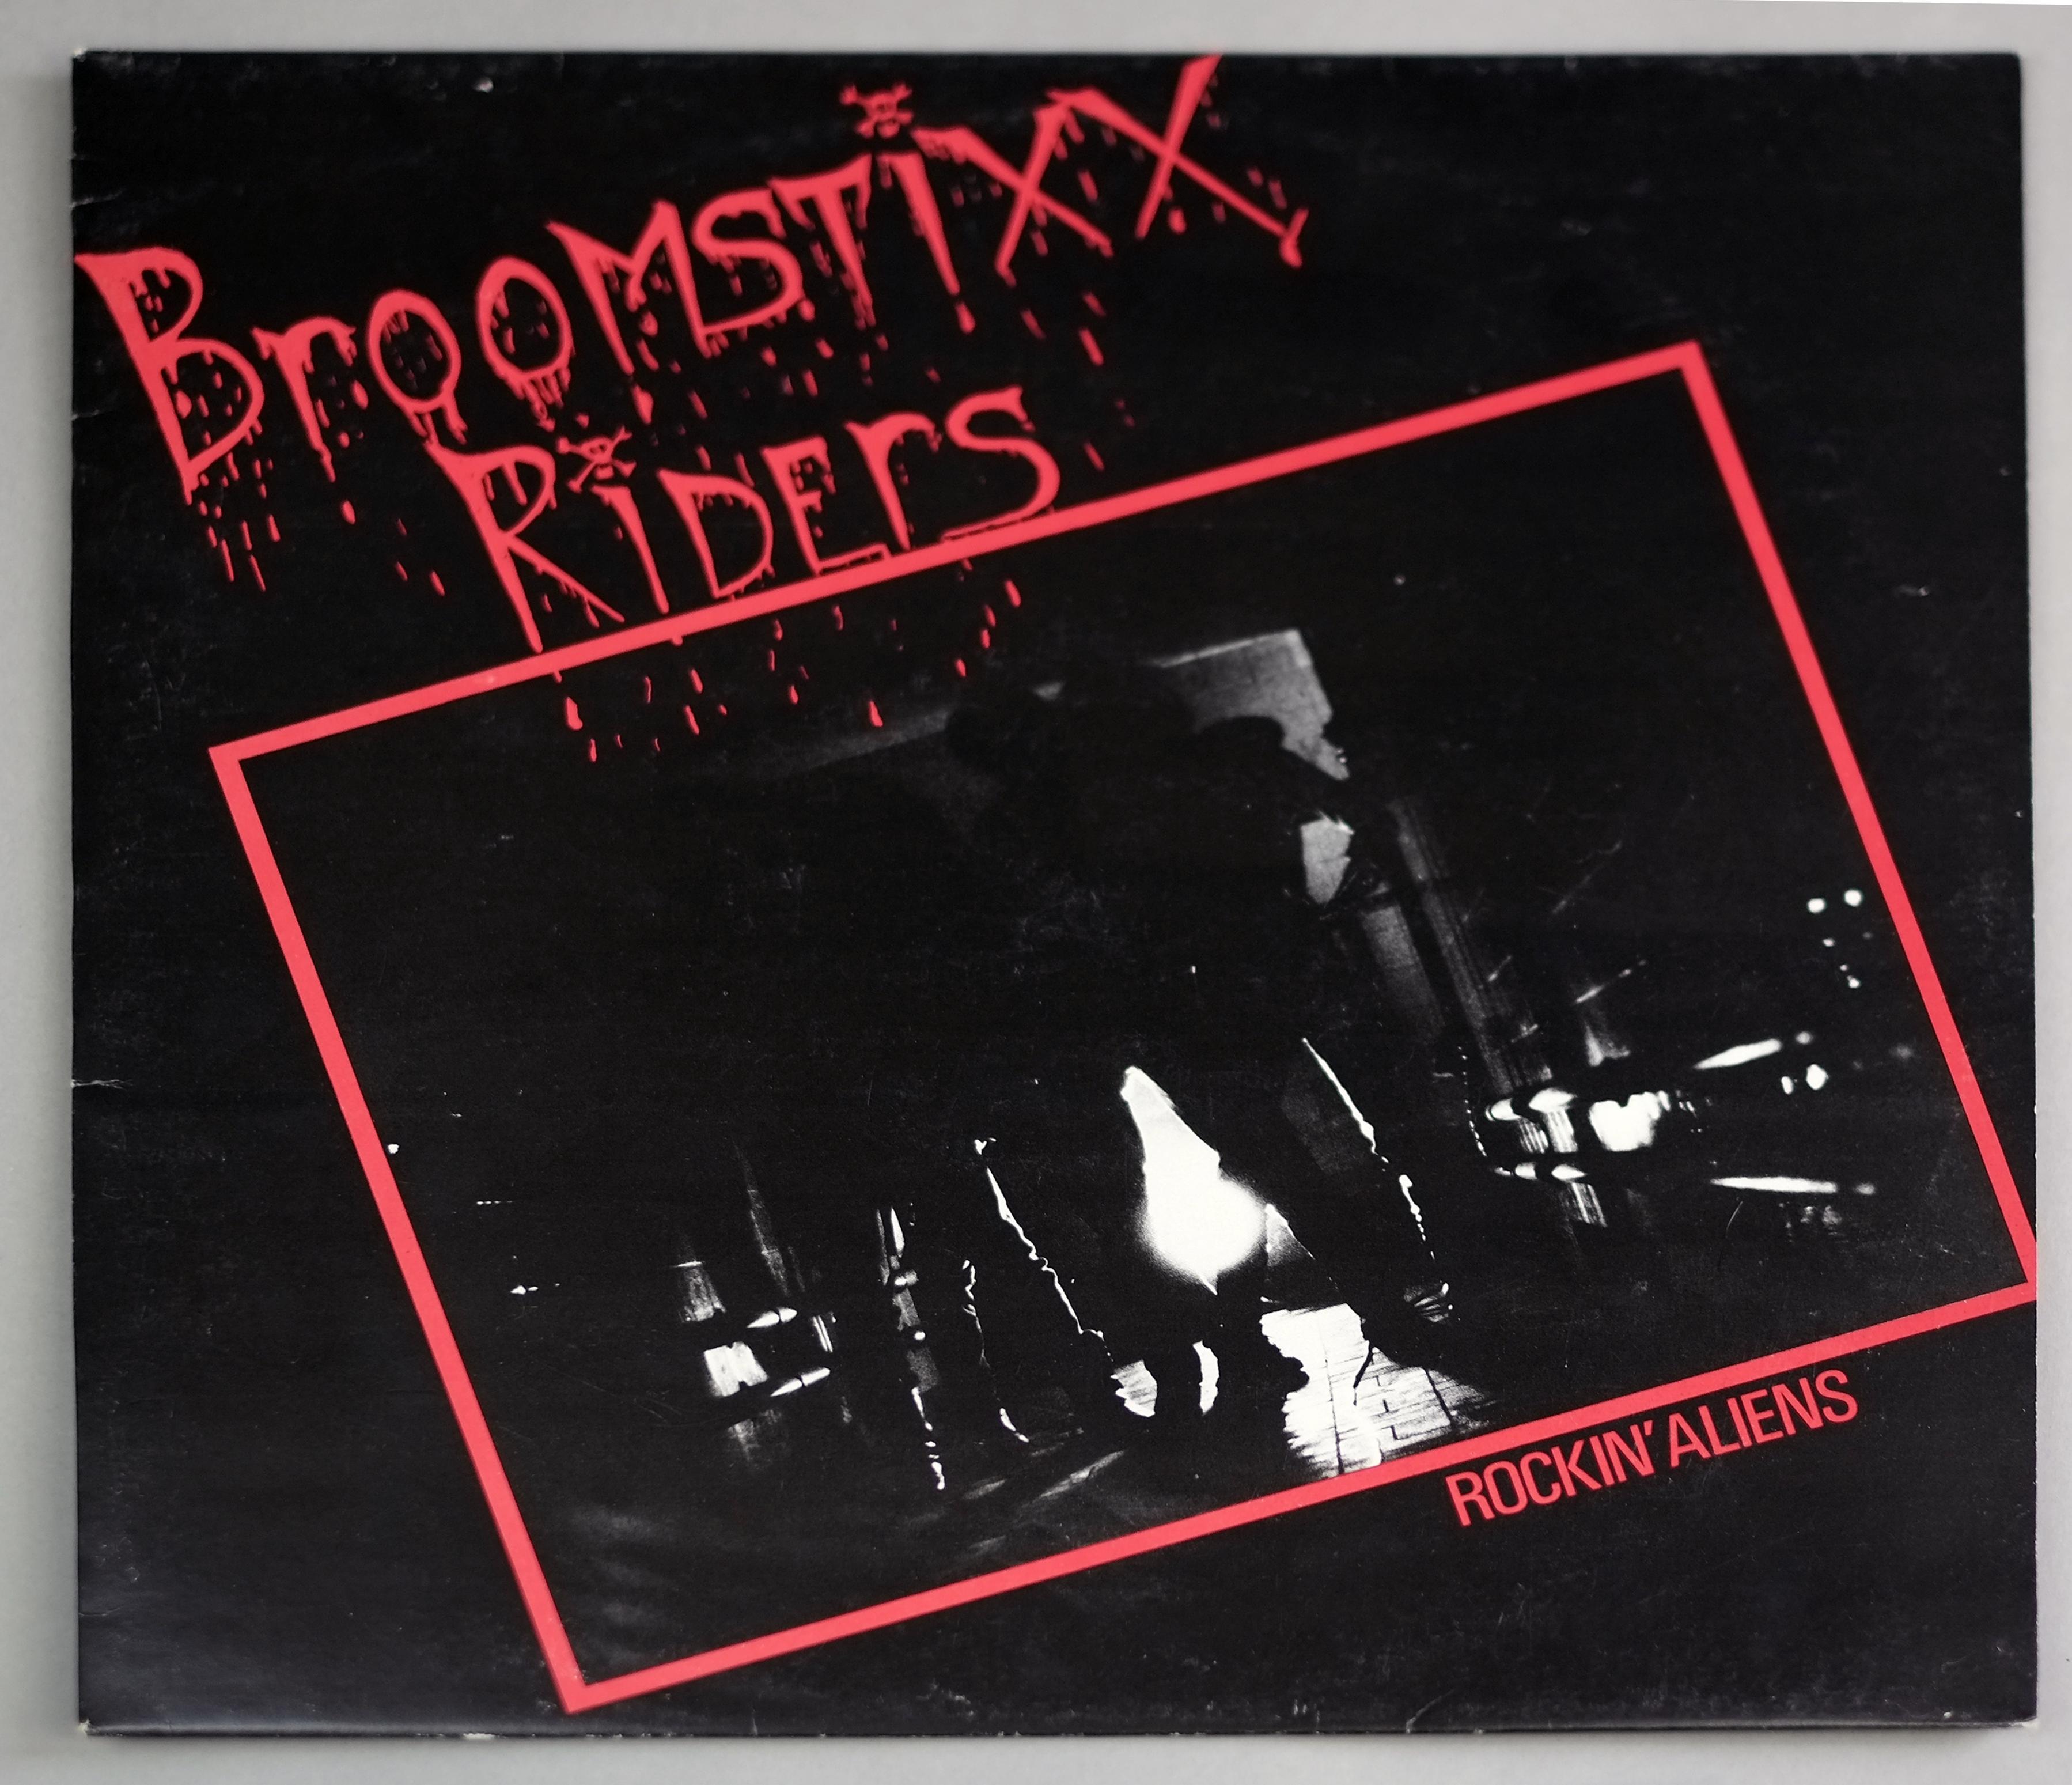 "BROOMSTIXX RIDERS ROCKIN' ALIENS PRIVATE SWISS HEAVY METAL 12"" LP VINYL"